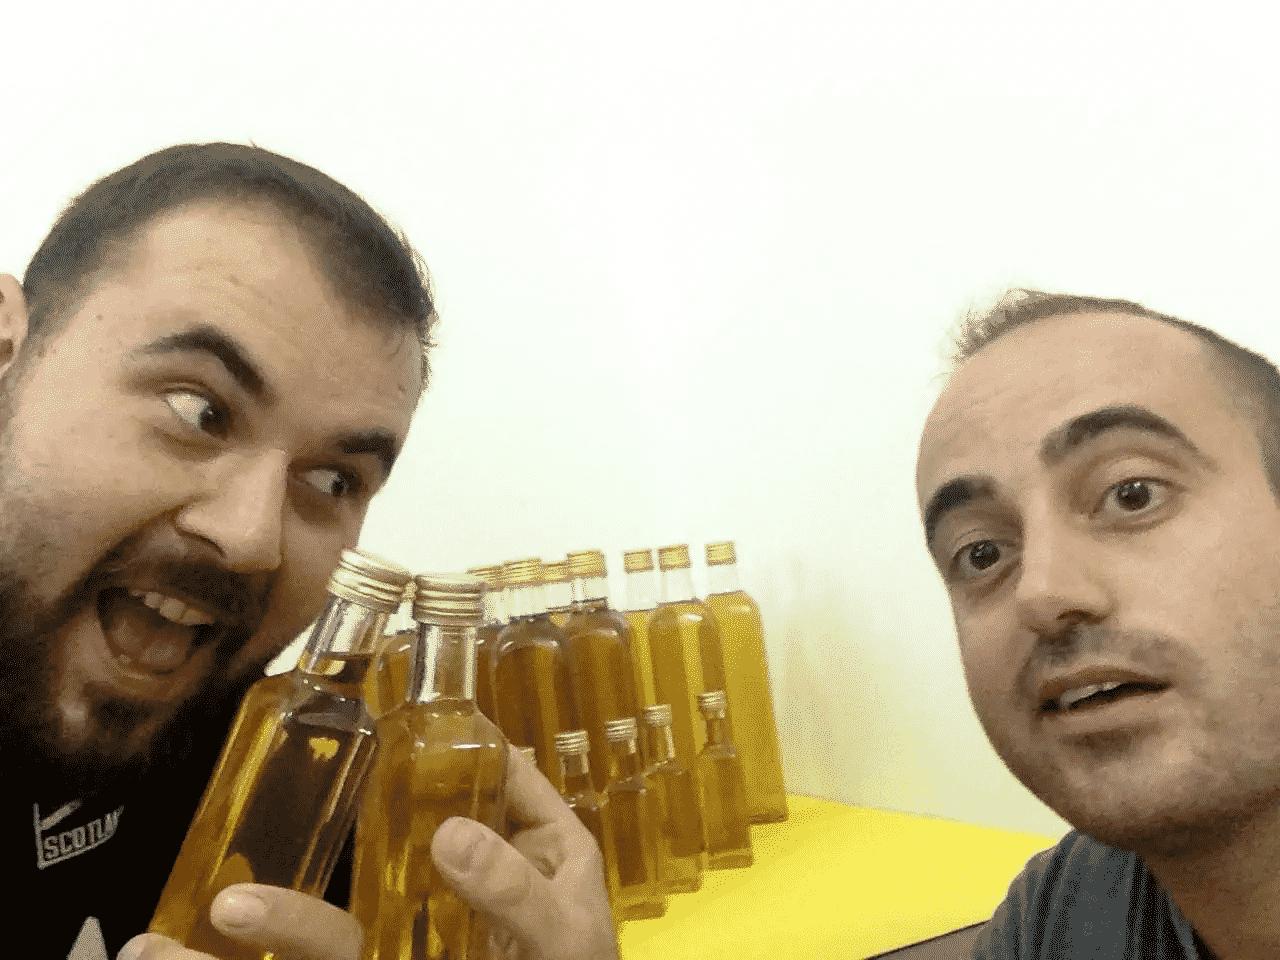 Liquore Genziana artigianale abruzzese